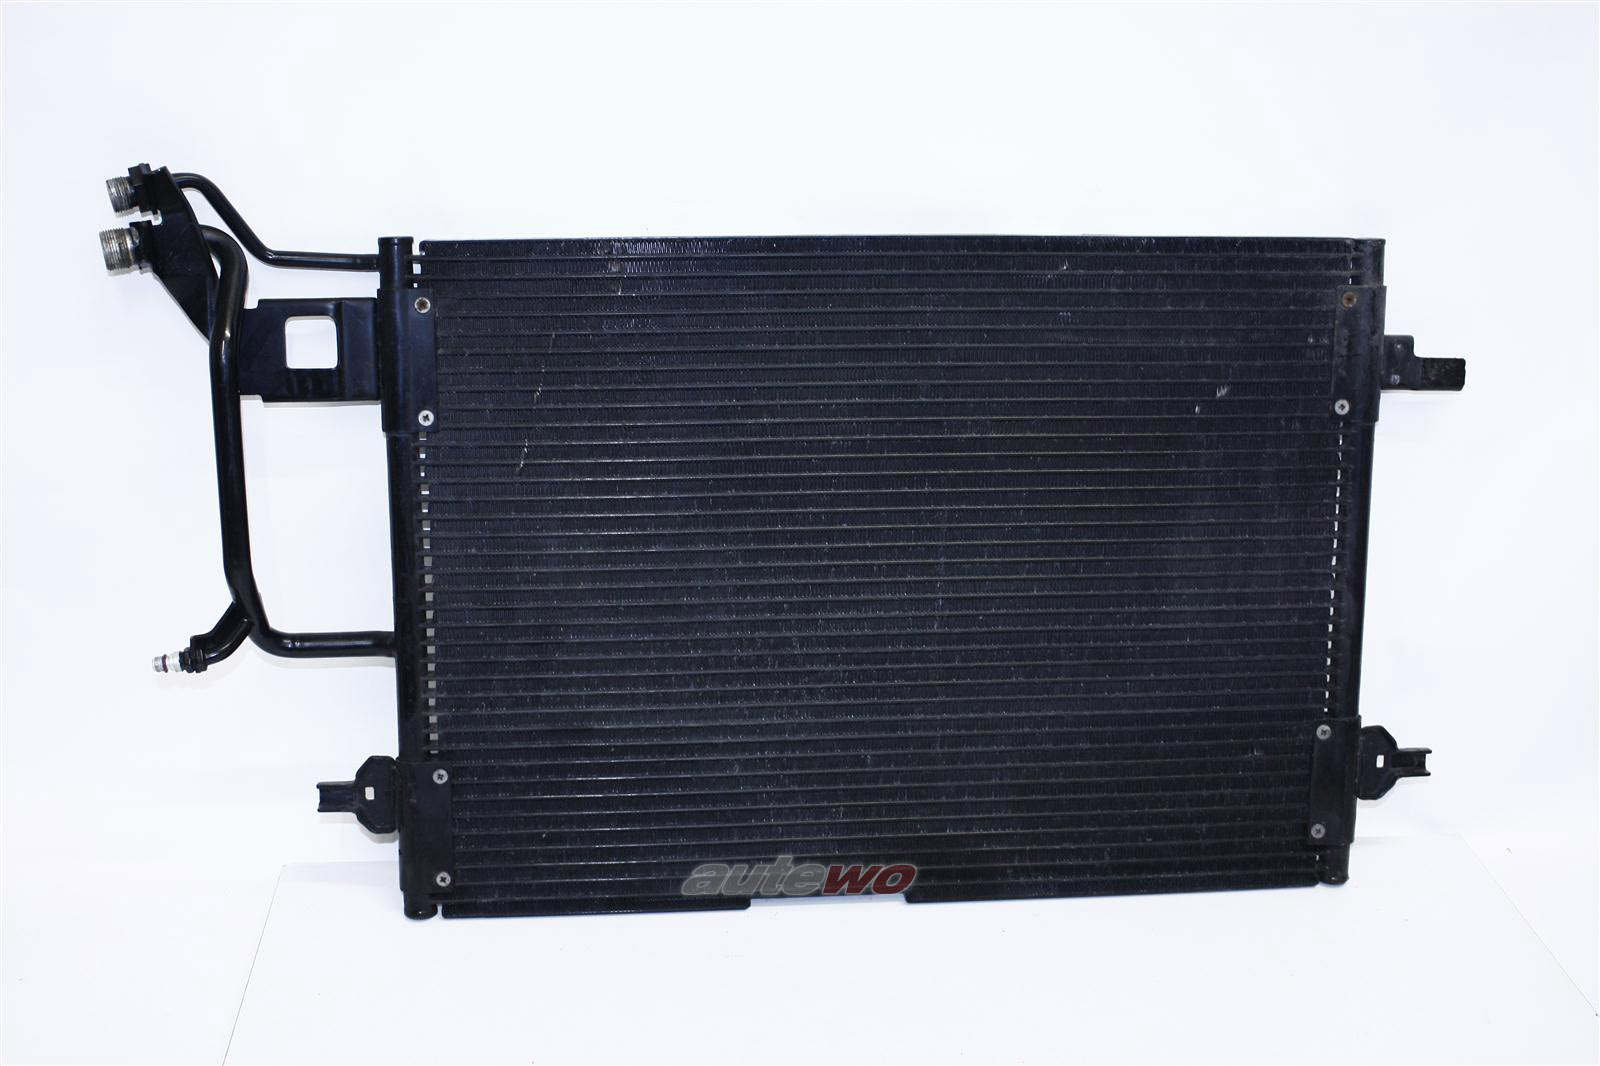 Audi A4 B5 4/6 Zylinder Kältemittel-/Klima-Kondensator 8D0260403C 8D0260401D